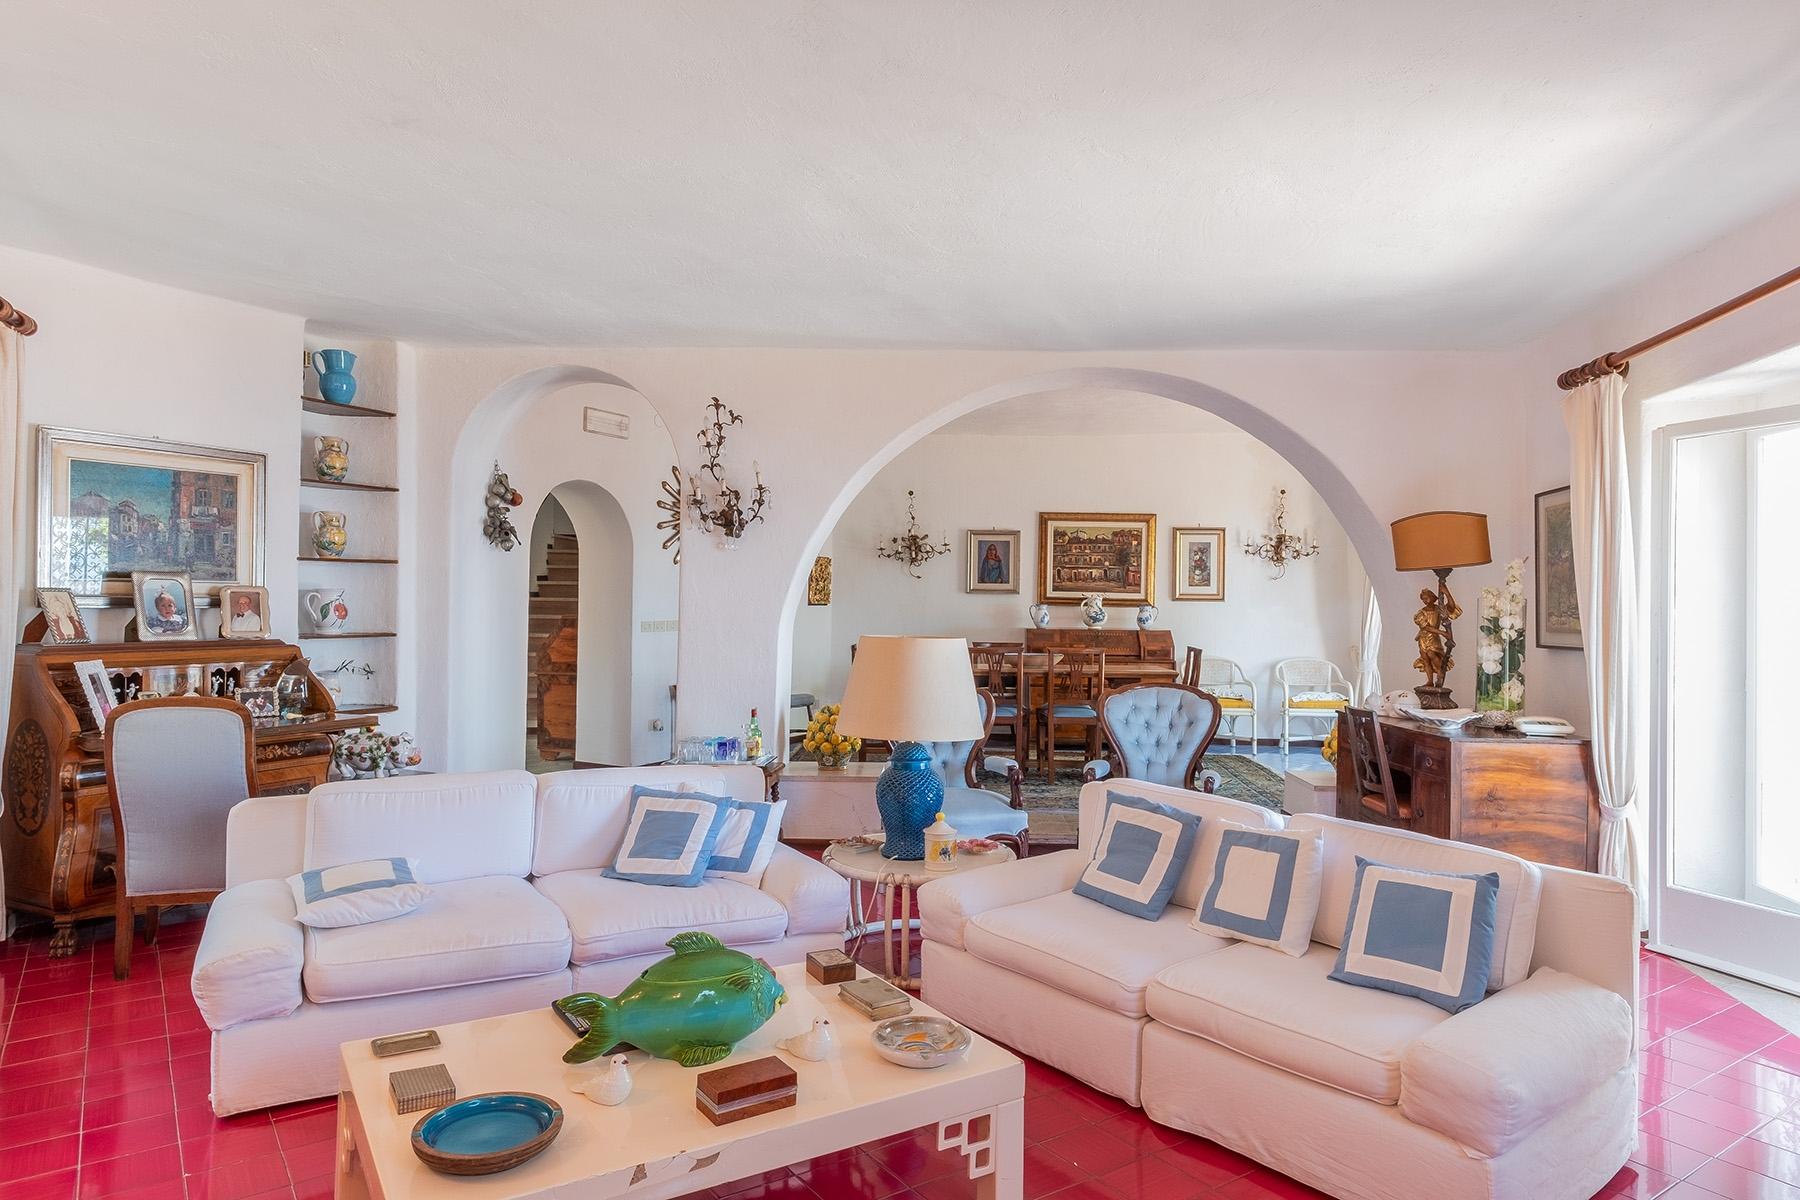 Villa in Vendita a Ischia: 5 locali, 206 mq - Foto 6